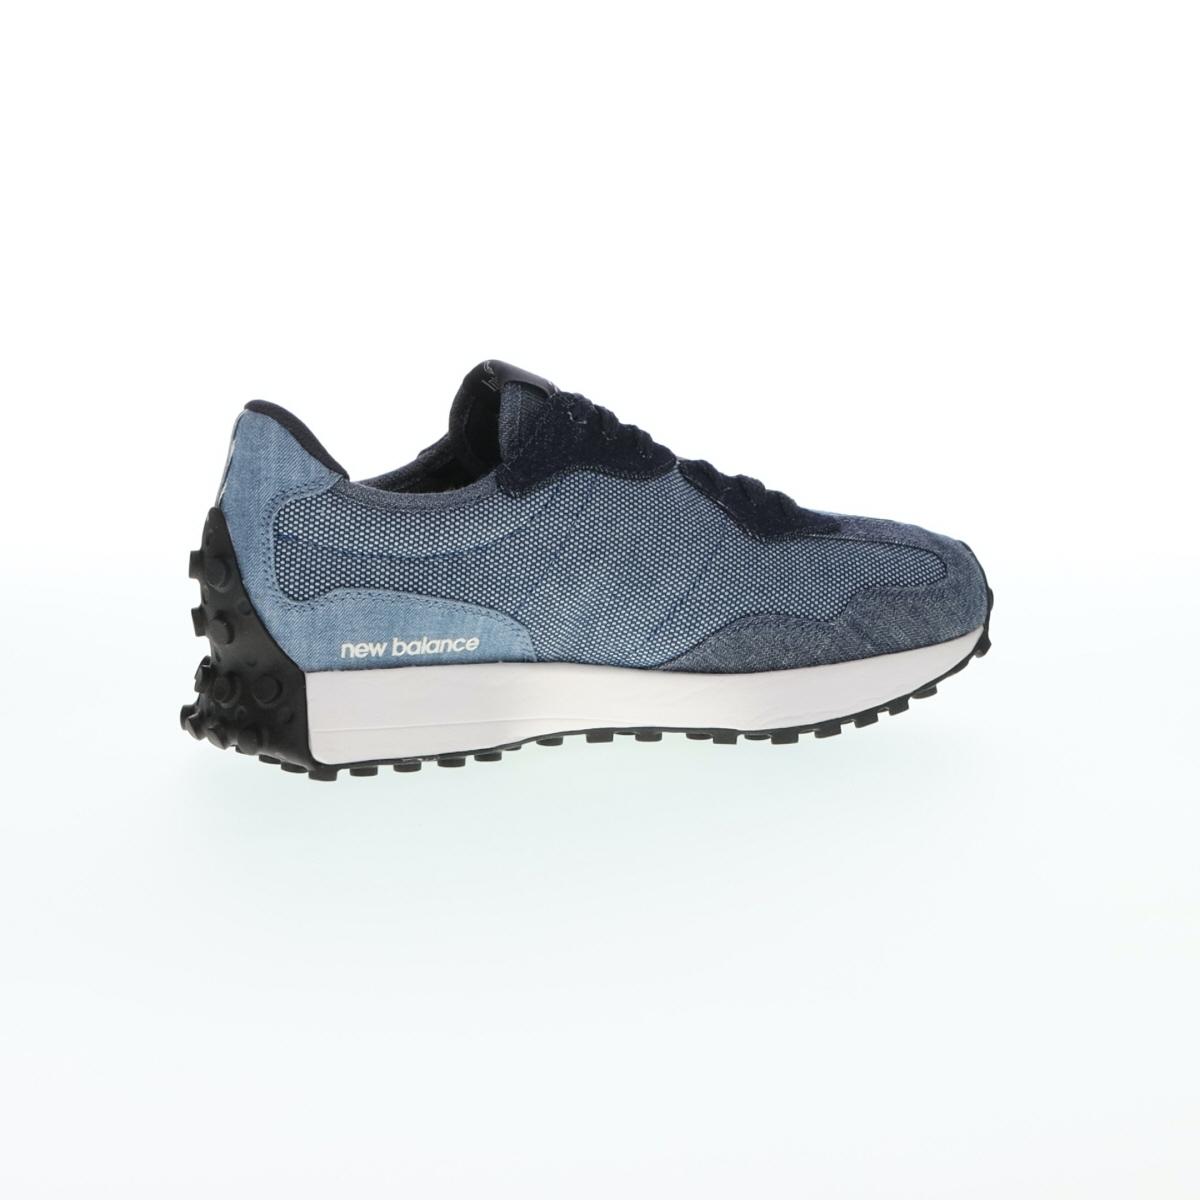 adidas ah2328 boots clearance